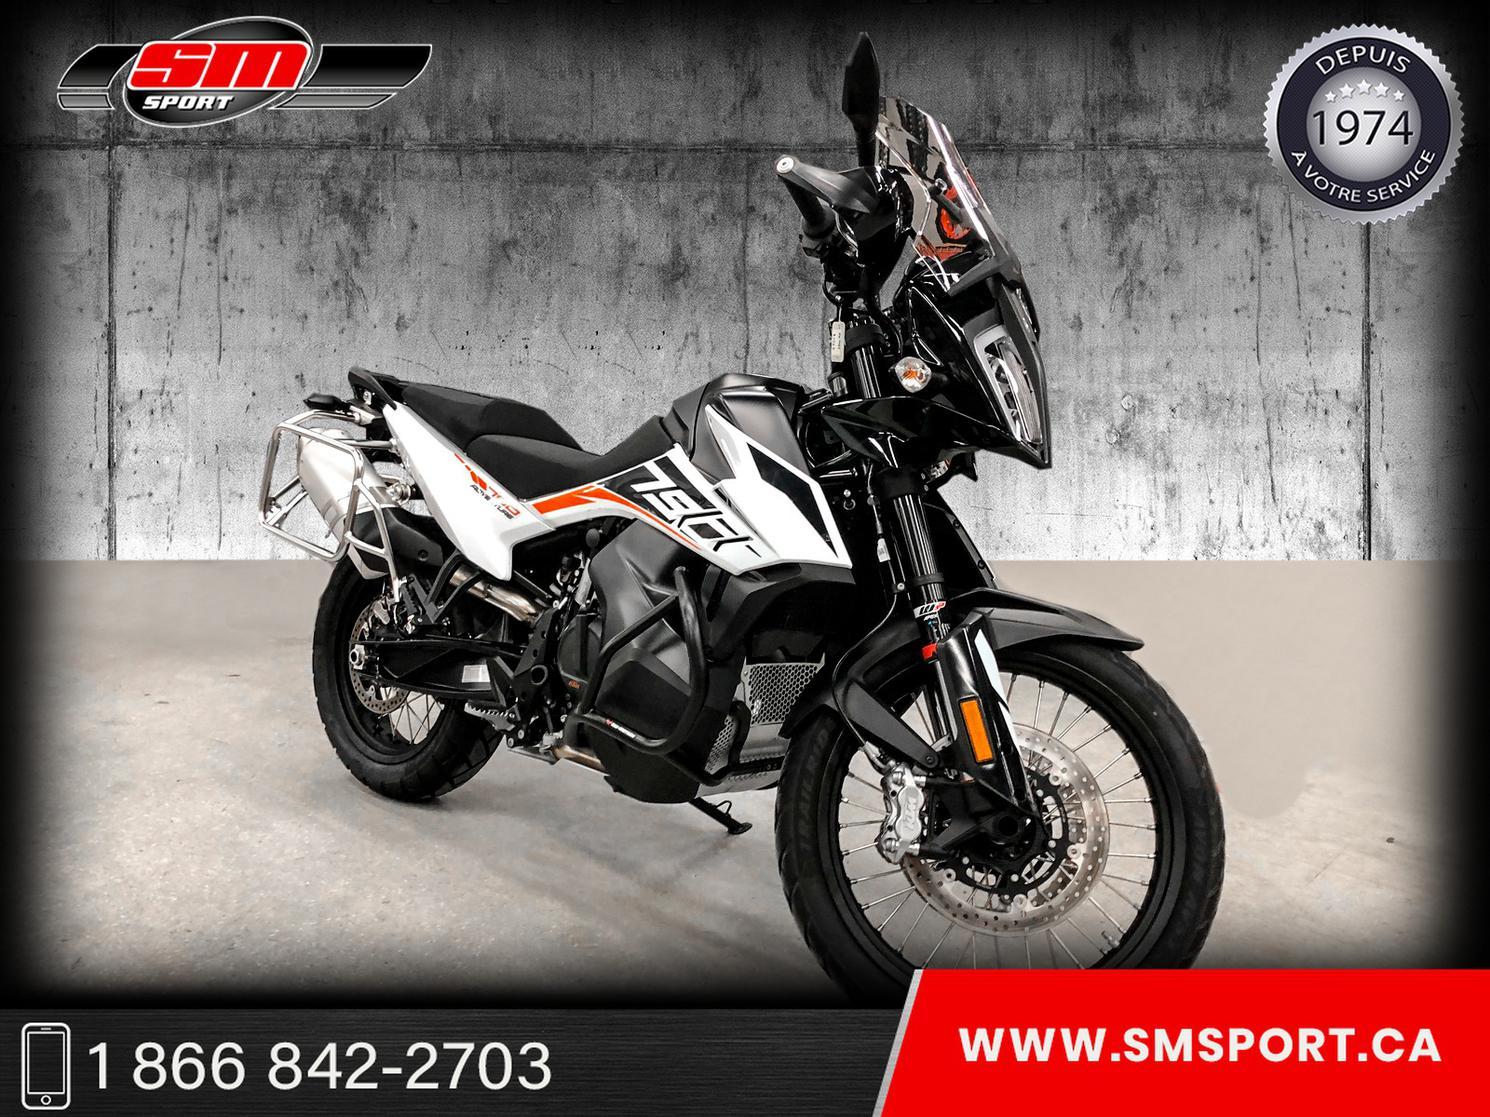 KTM ADVENTURE 790 2019